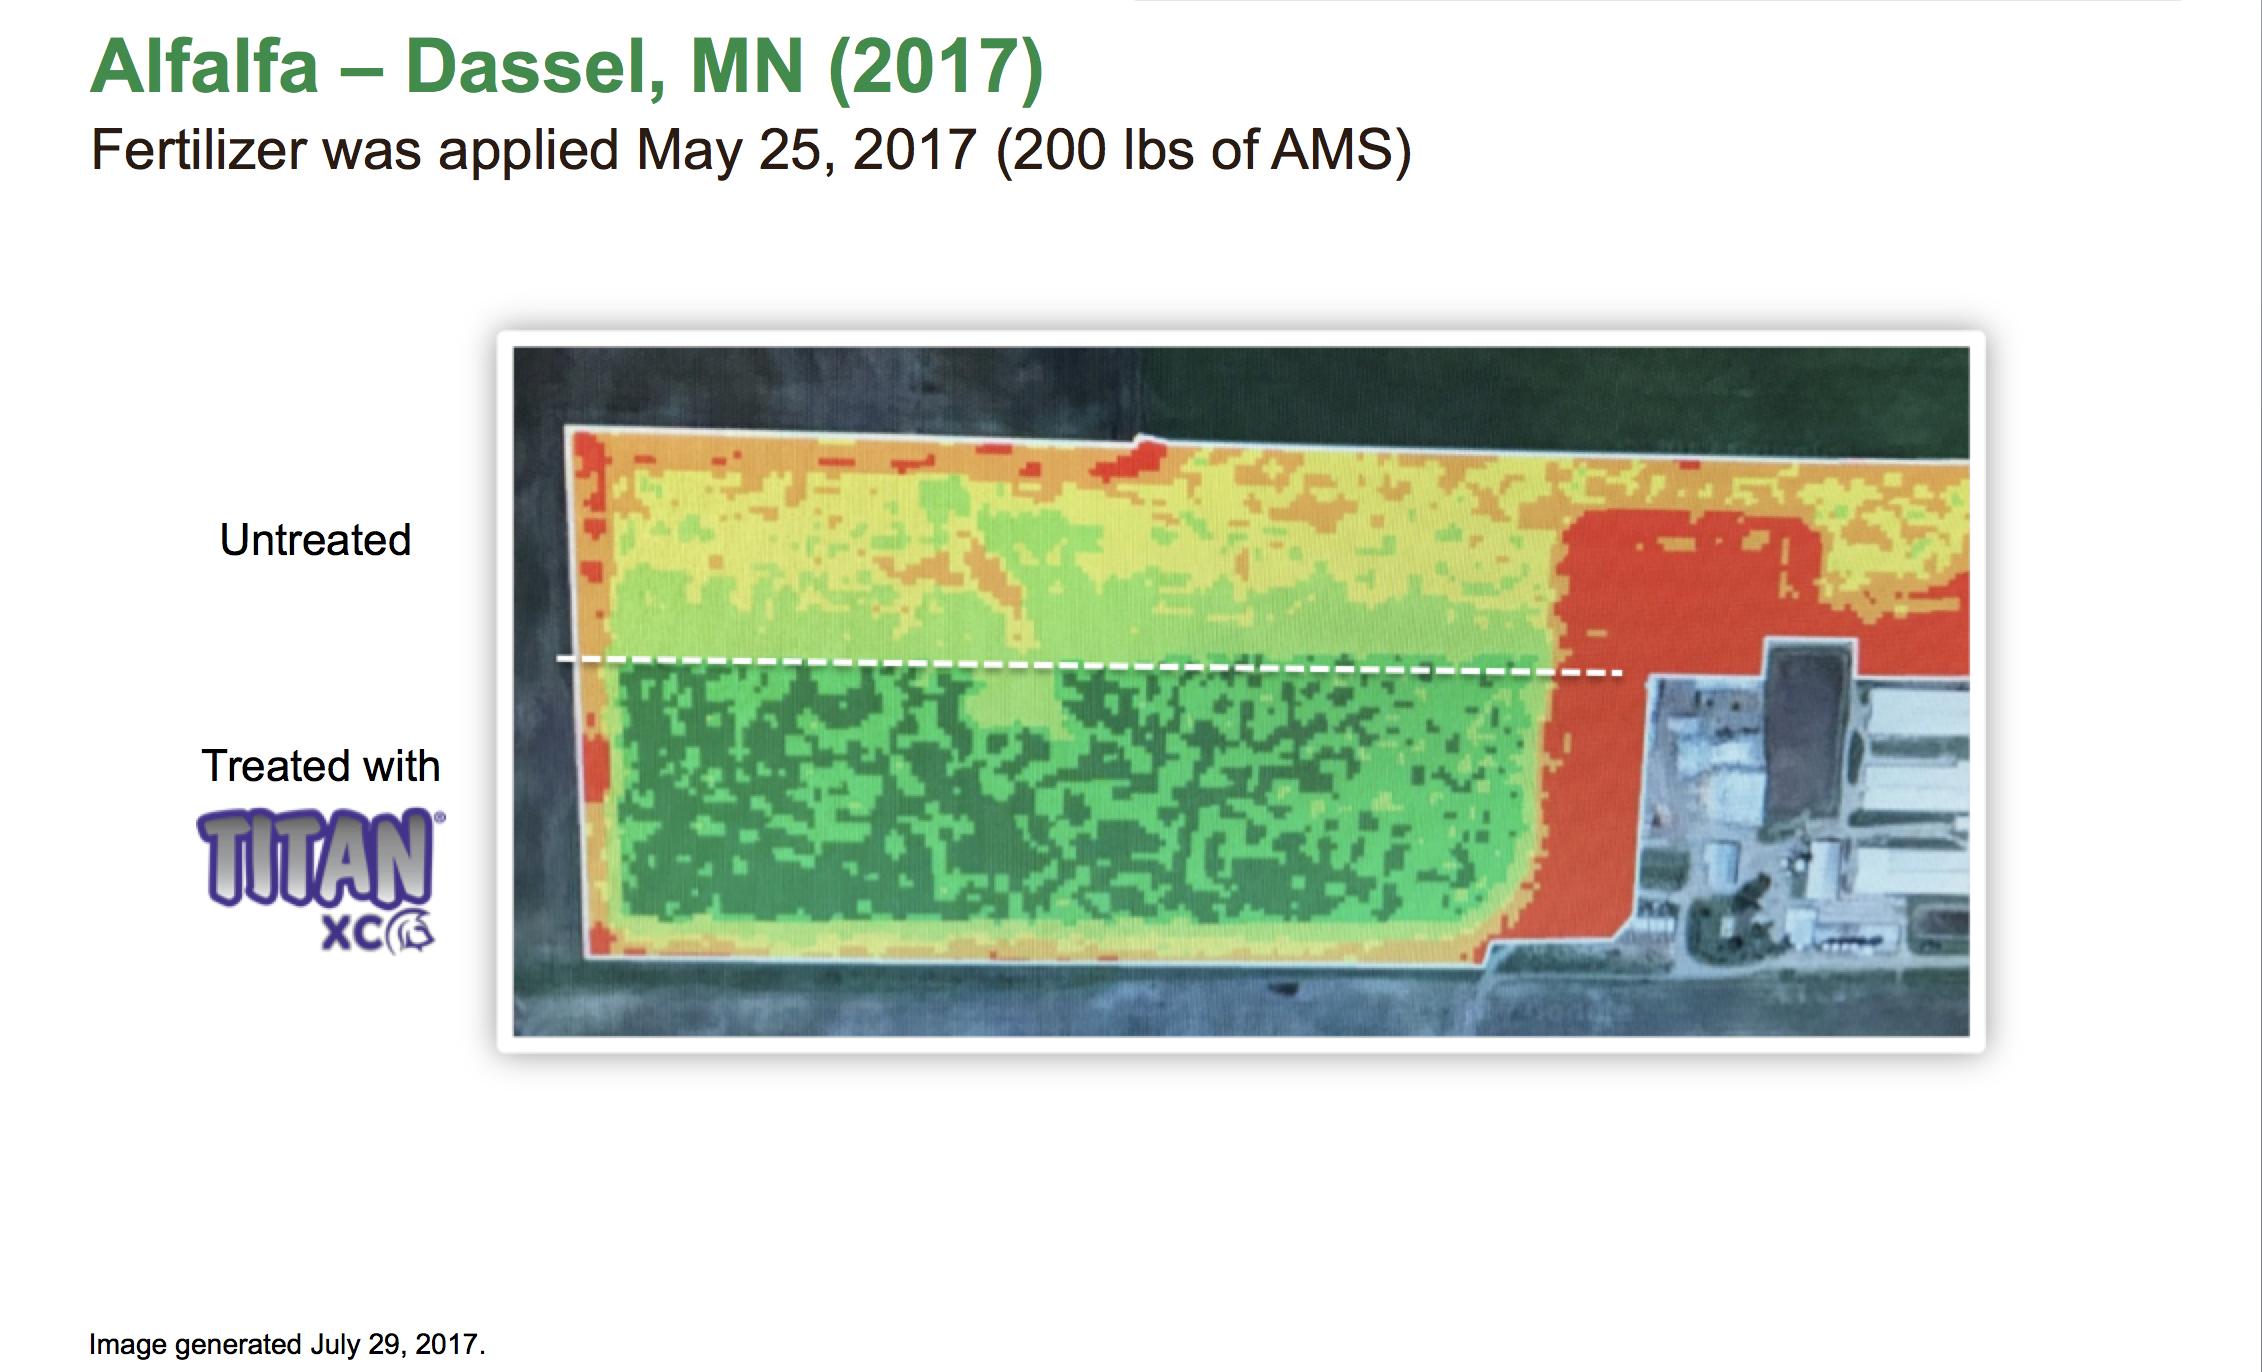 Alfalfa – Dassel MN